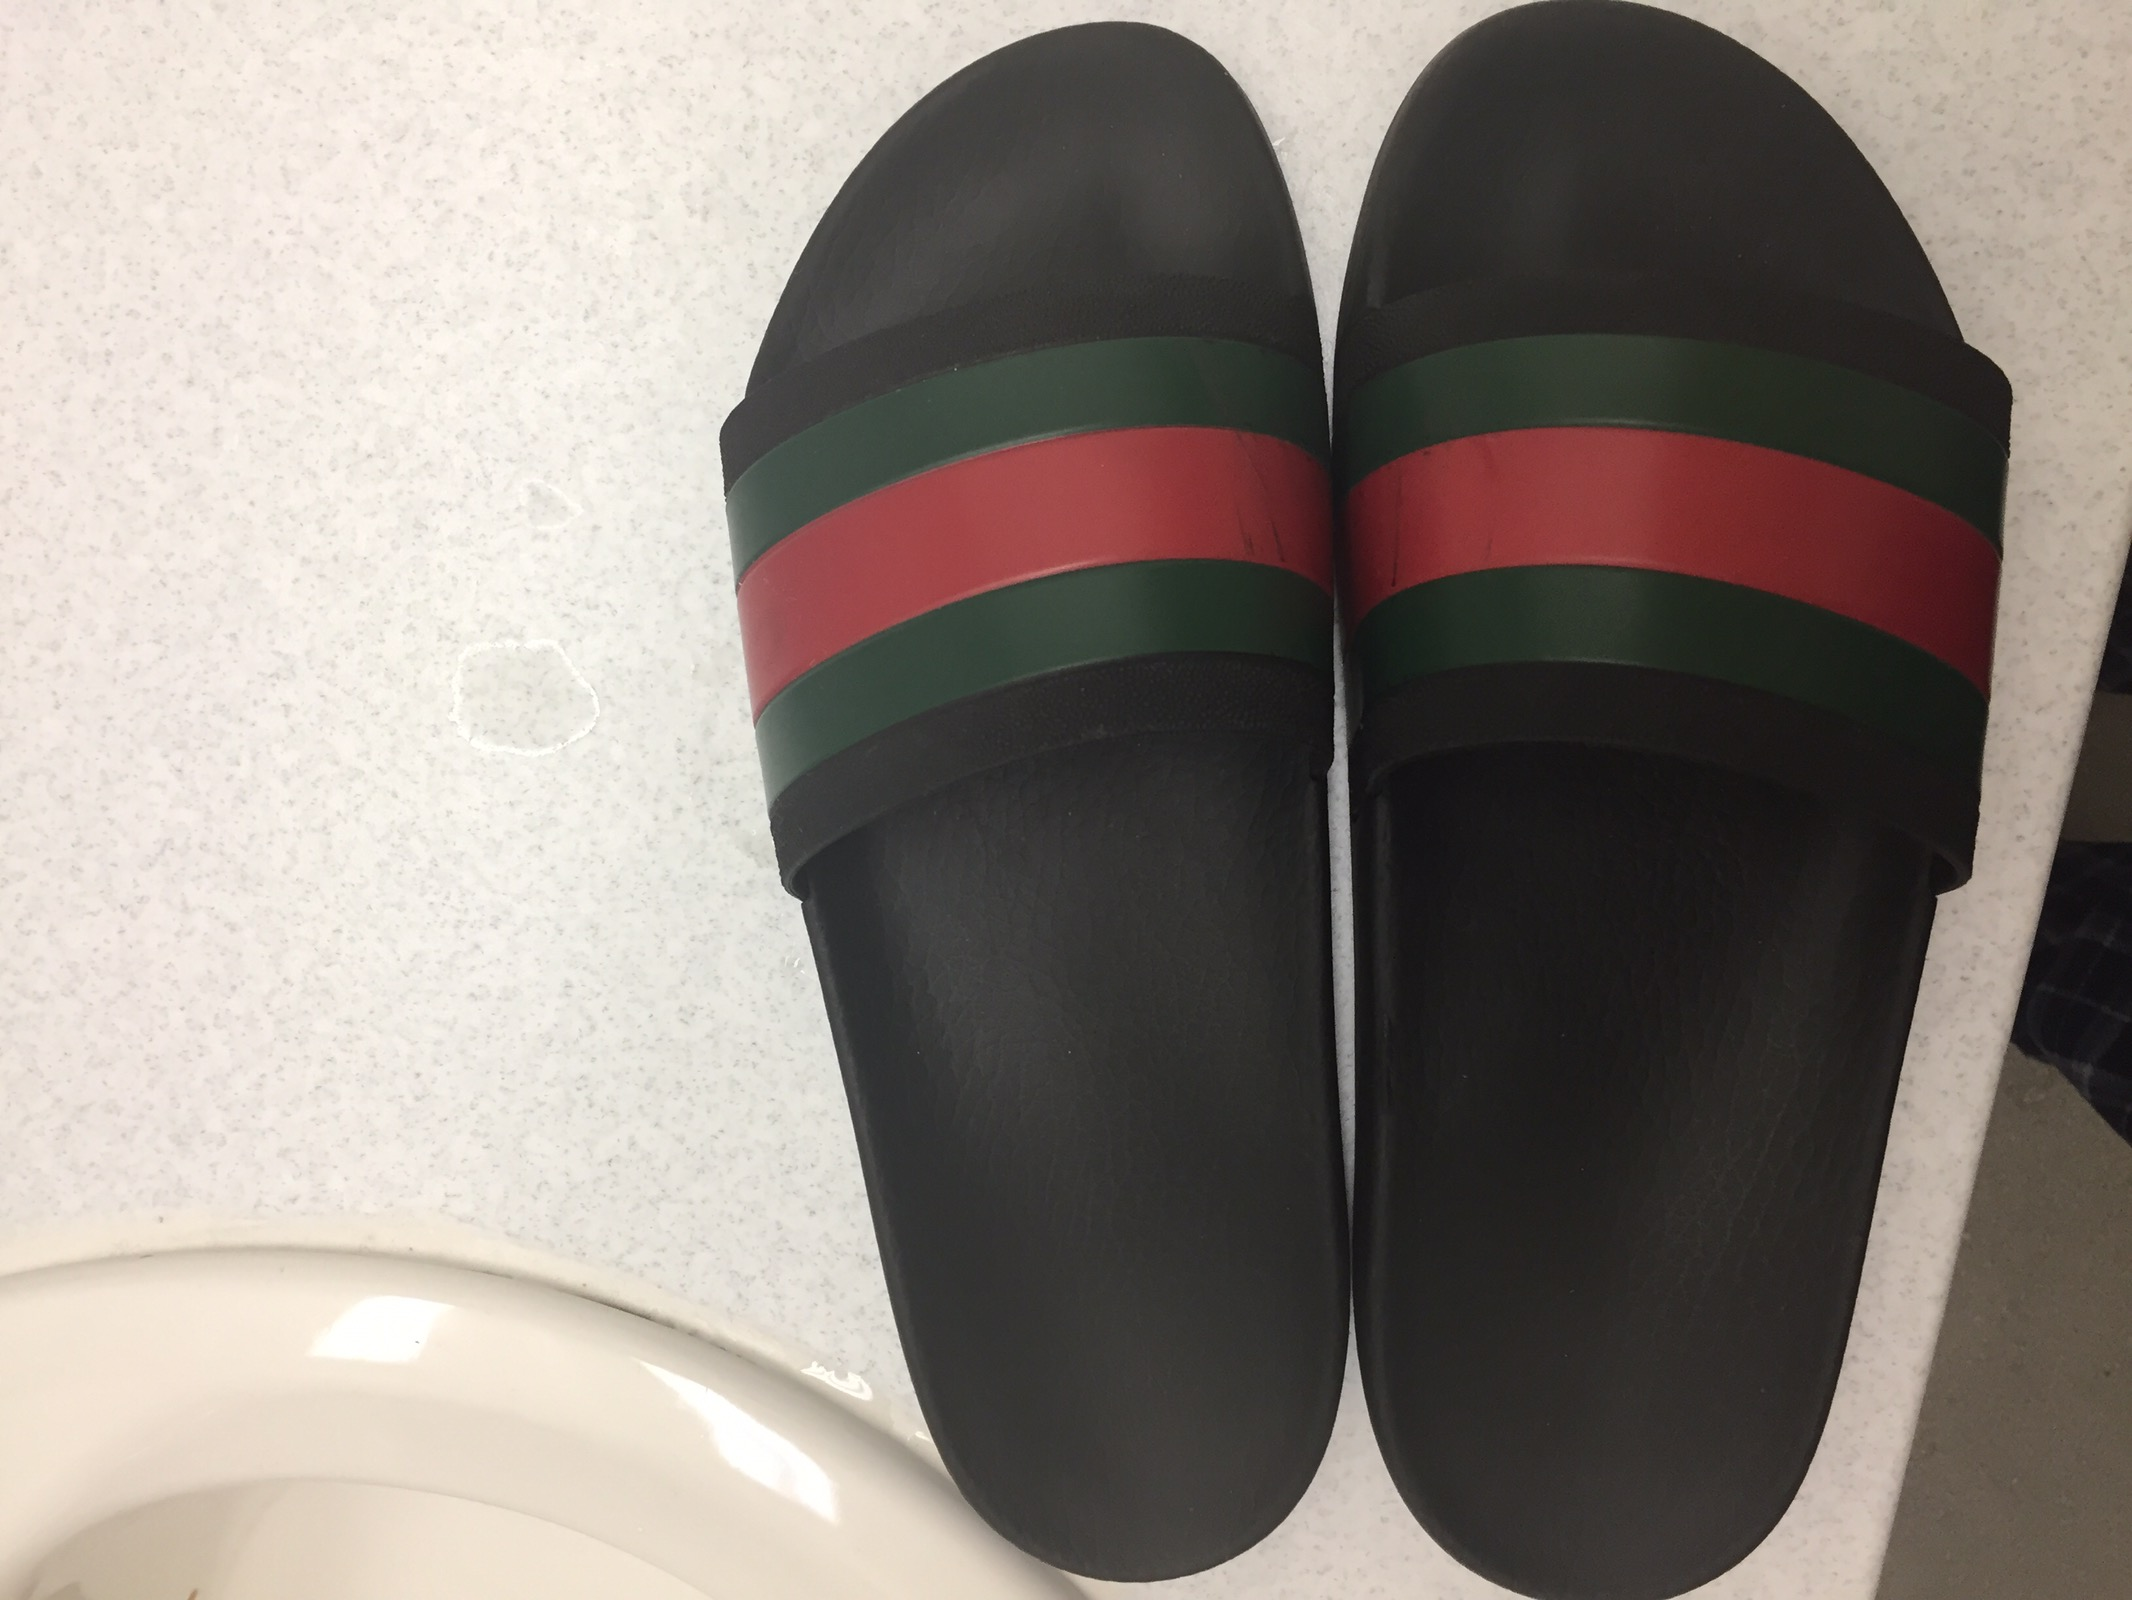 b1f1da386dbd Gucci GUCCI FLIP FLOPS RETAIL  200 Size 11 - Sandals for Sale - Grailed